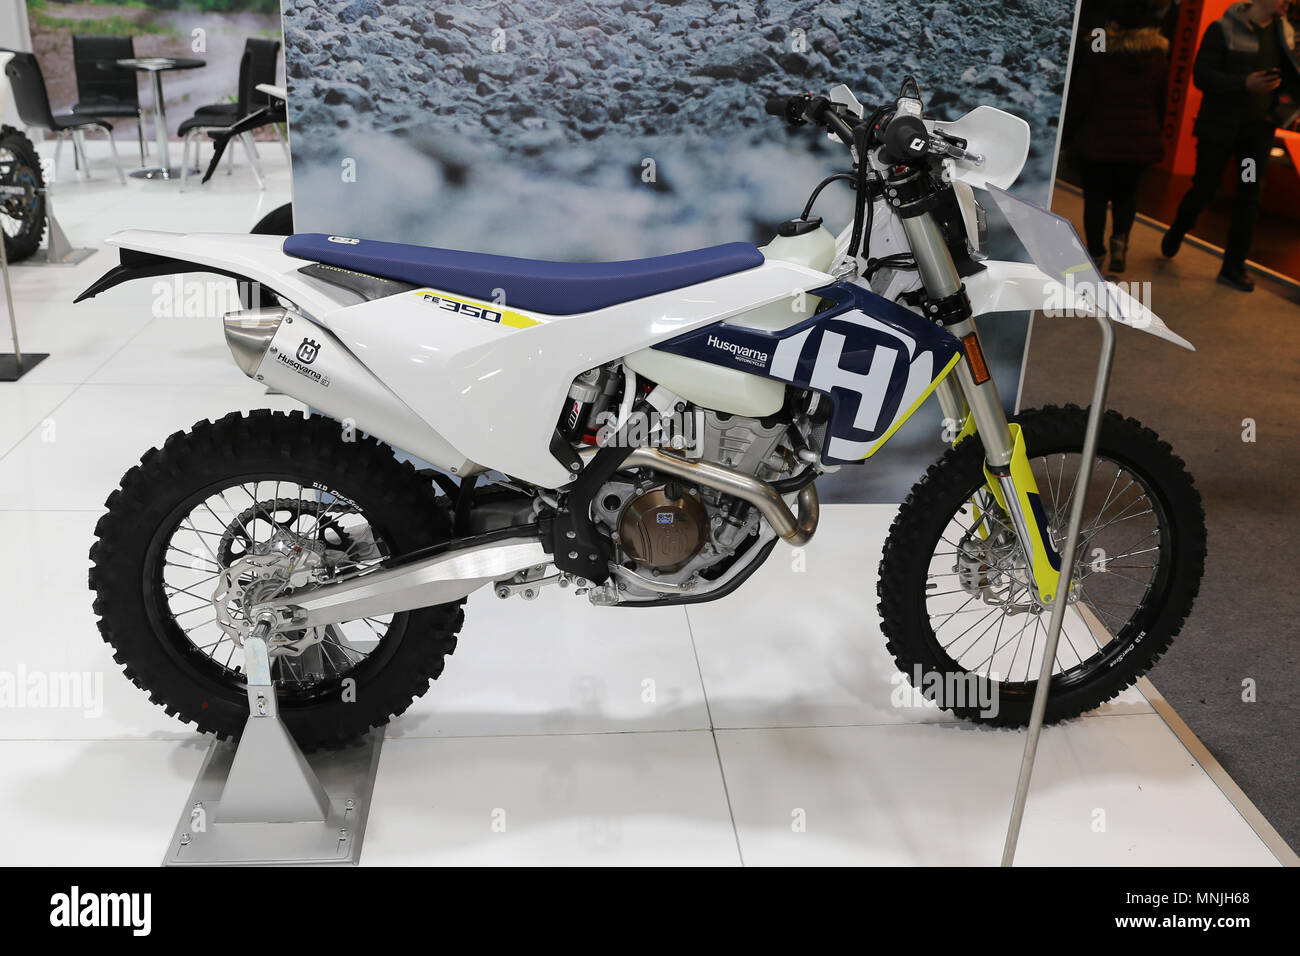 ISTANBUL, TURKEY - FEBRUARY 25, 2018: Husqvarna FE 350 on display at Motobike Istanbul in Istanbul Exhibition Center - Stock Image